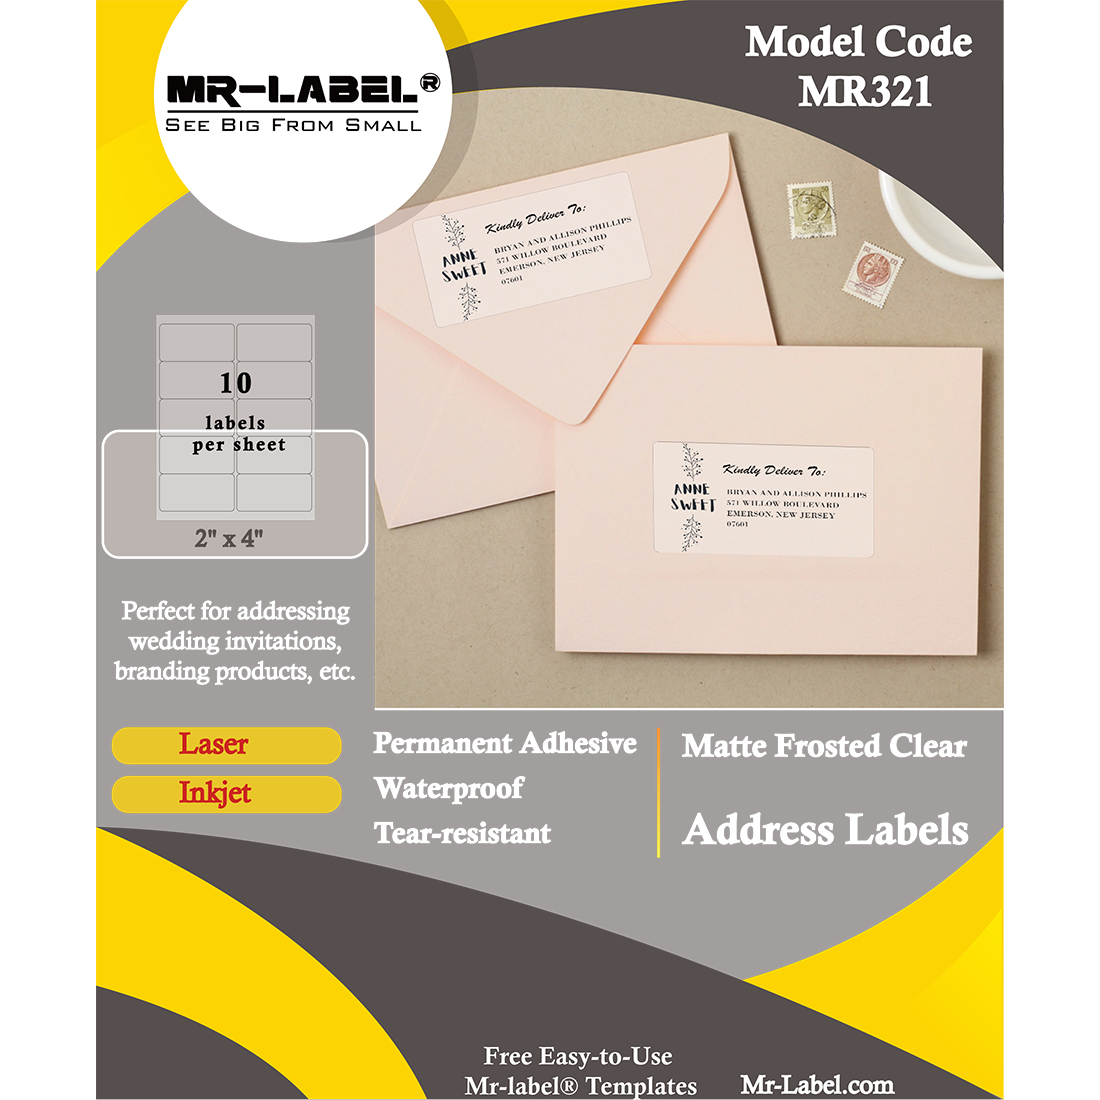 Mr Label 2 X 4 Translucent Address Labels Waterproof And Tear Resistant For Inkjet Laser Printer Permanent Adhesive For Frosted Glass Envelope Mr Label